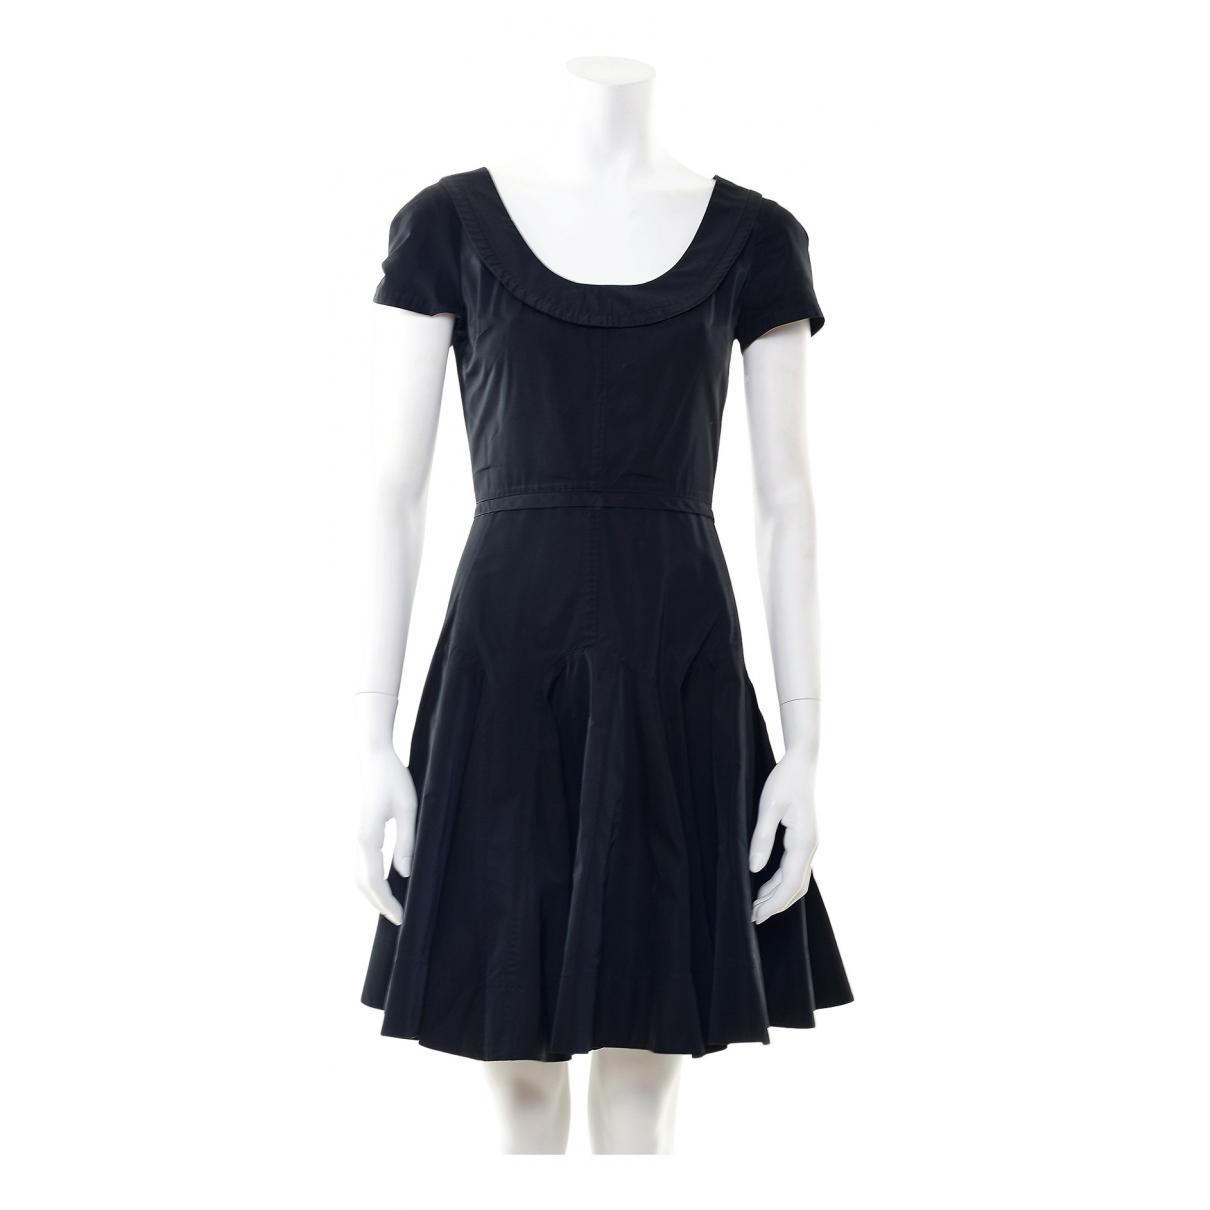 Louis Vuitton \N Kleid in  Schwarz Synthetik